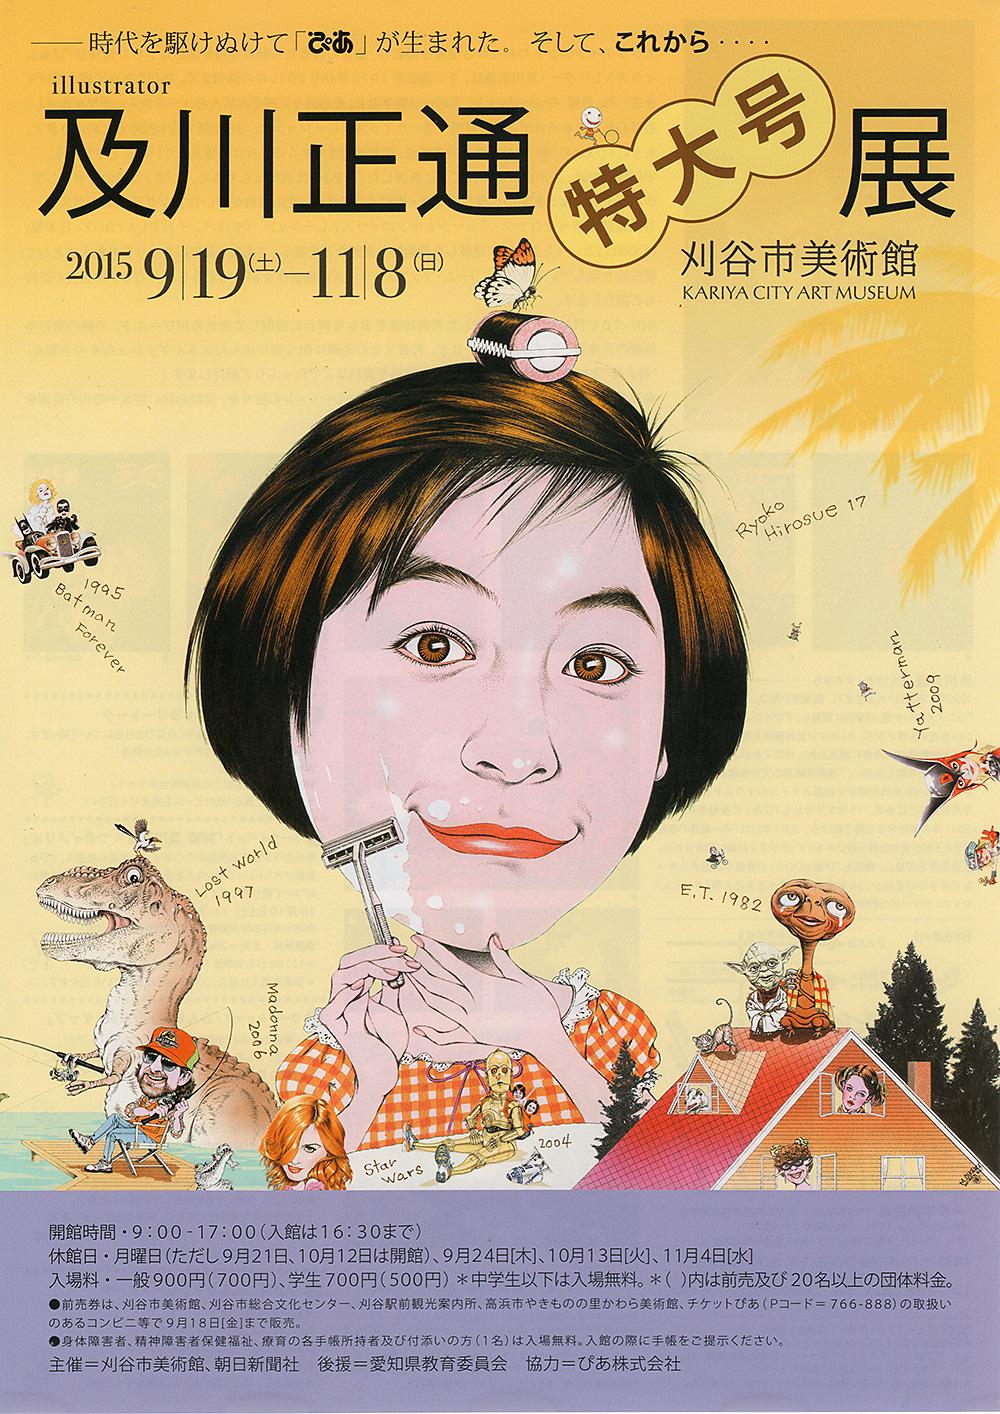 151020oikawa_pia_kariya01web.jpg